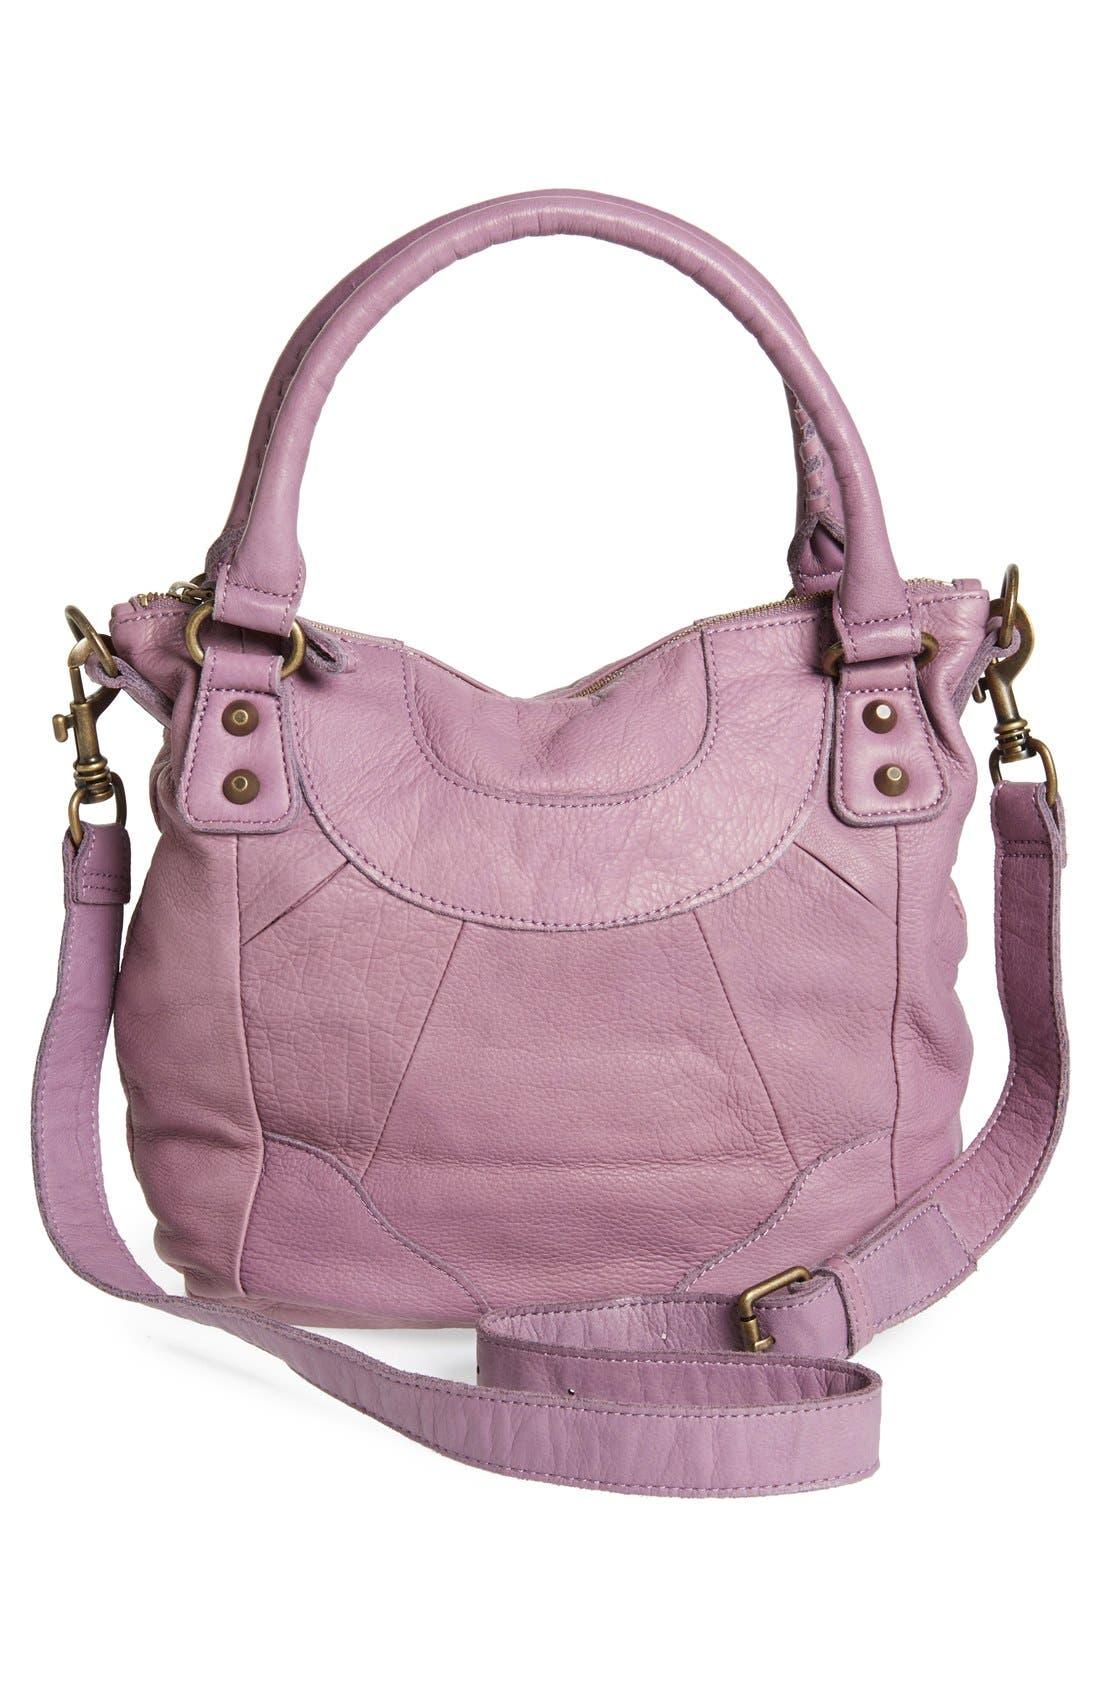 'Vintage Gina' Soft Leather Handbag,                             Alternate thumbnail 2, color,                             500